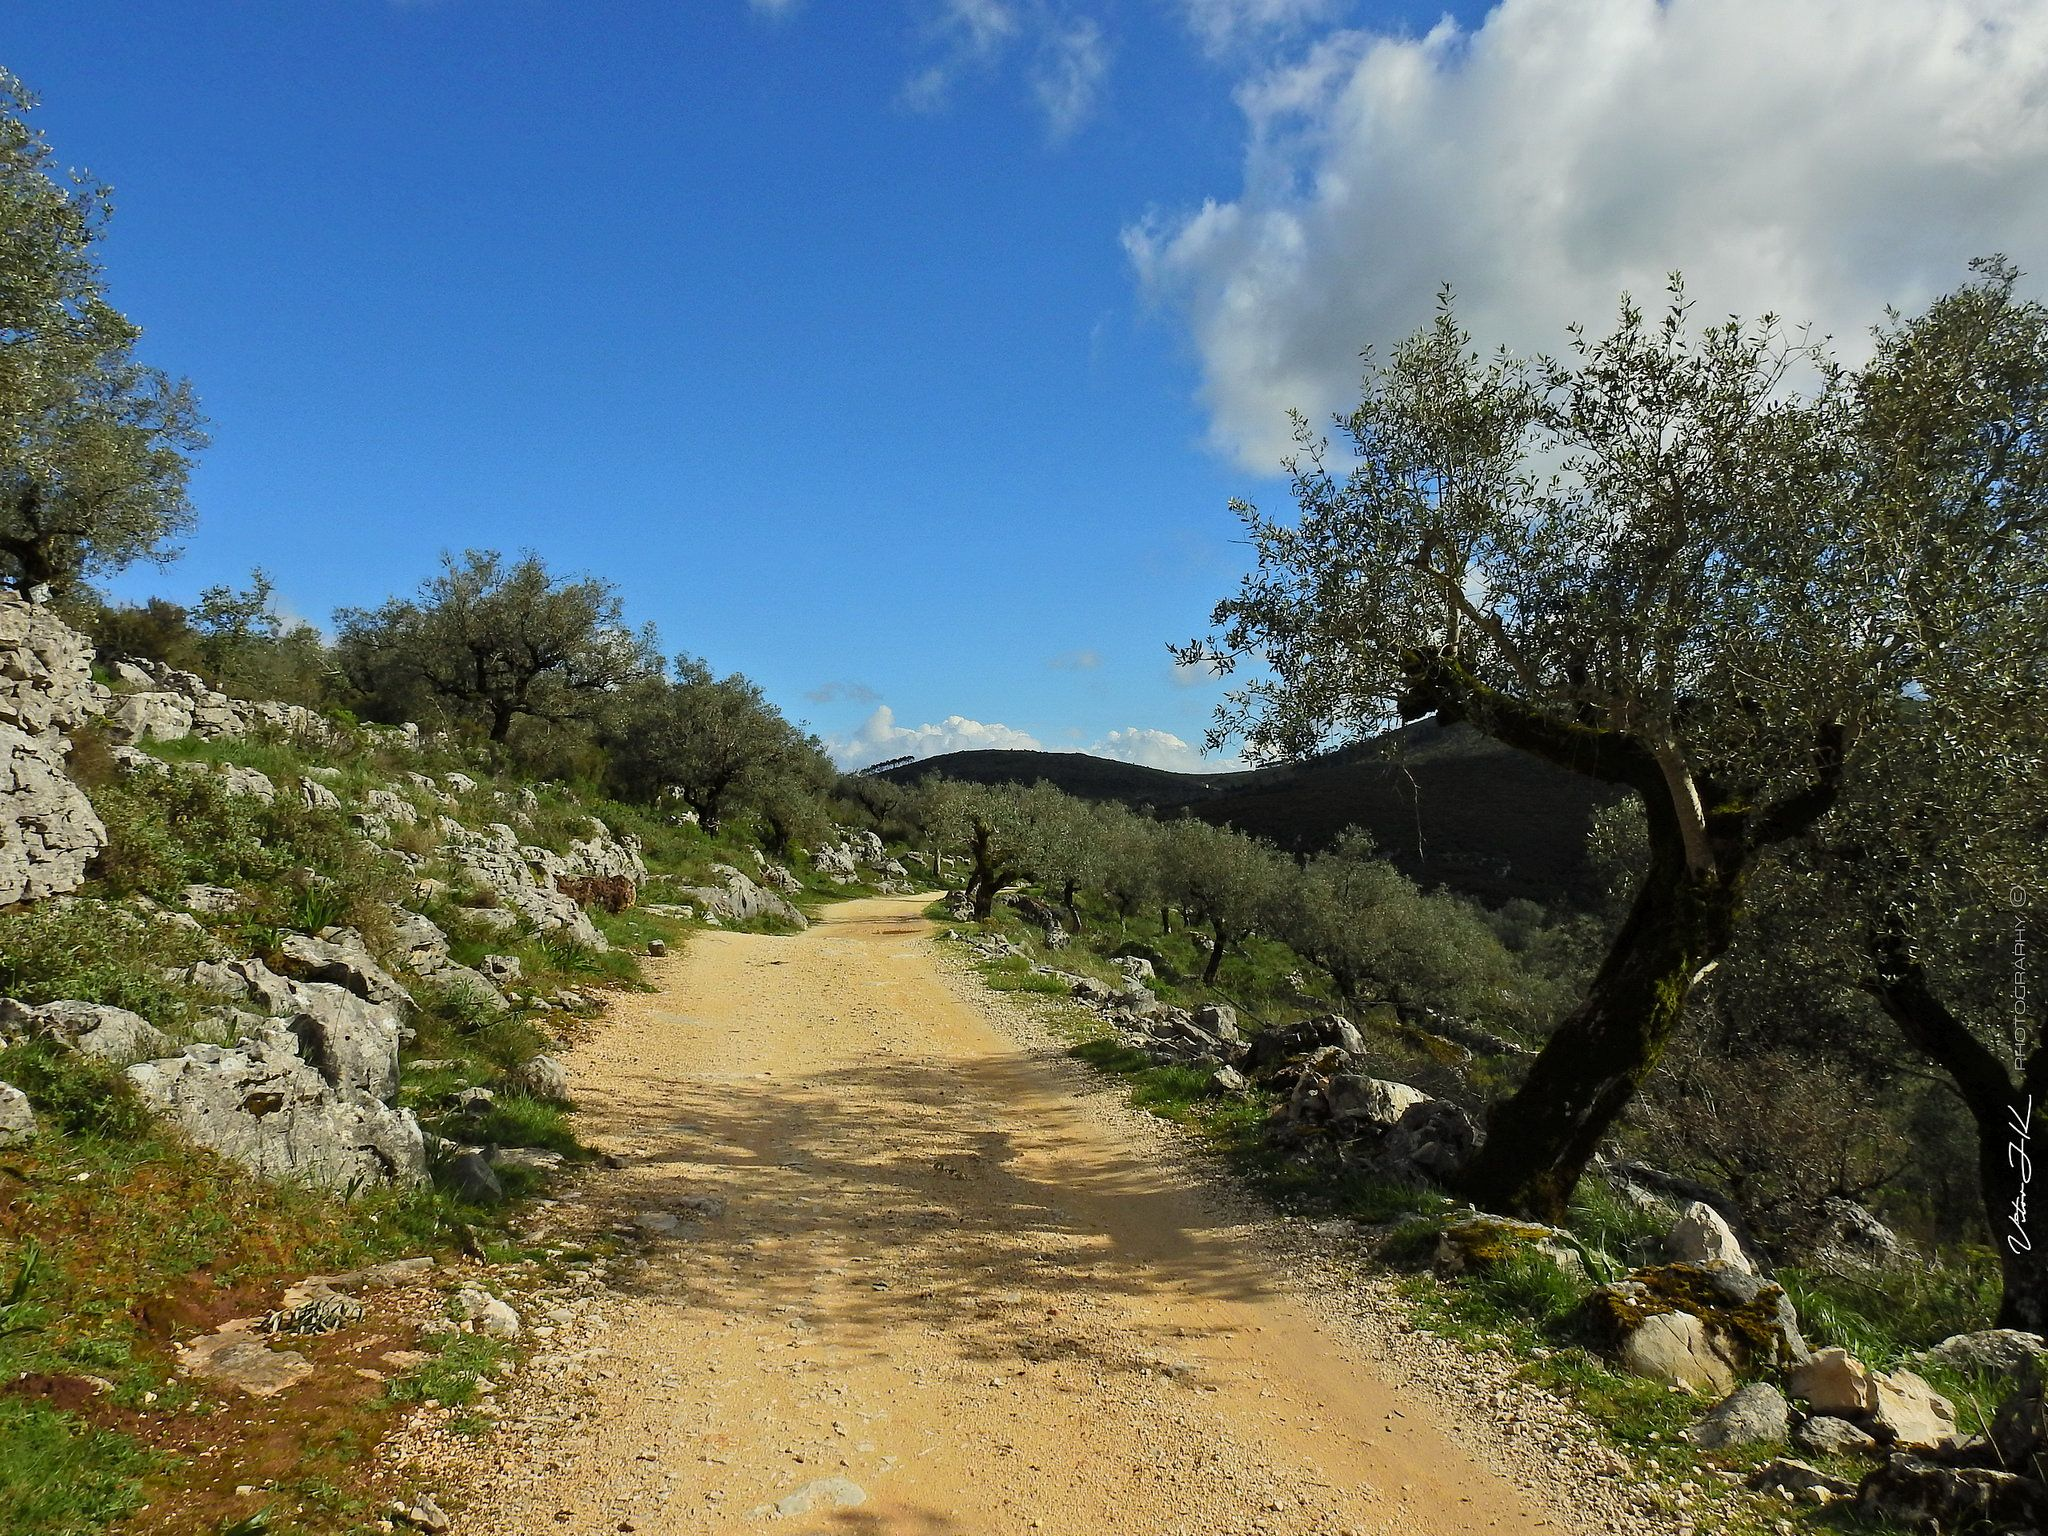 PhotoWalk at Casmilo n3318 Portugal travel, Country